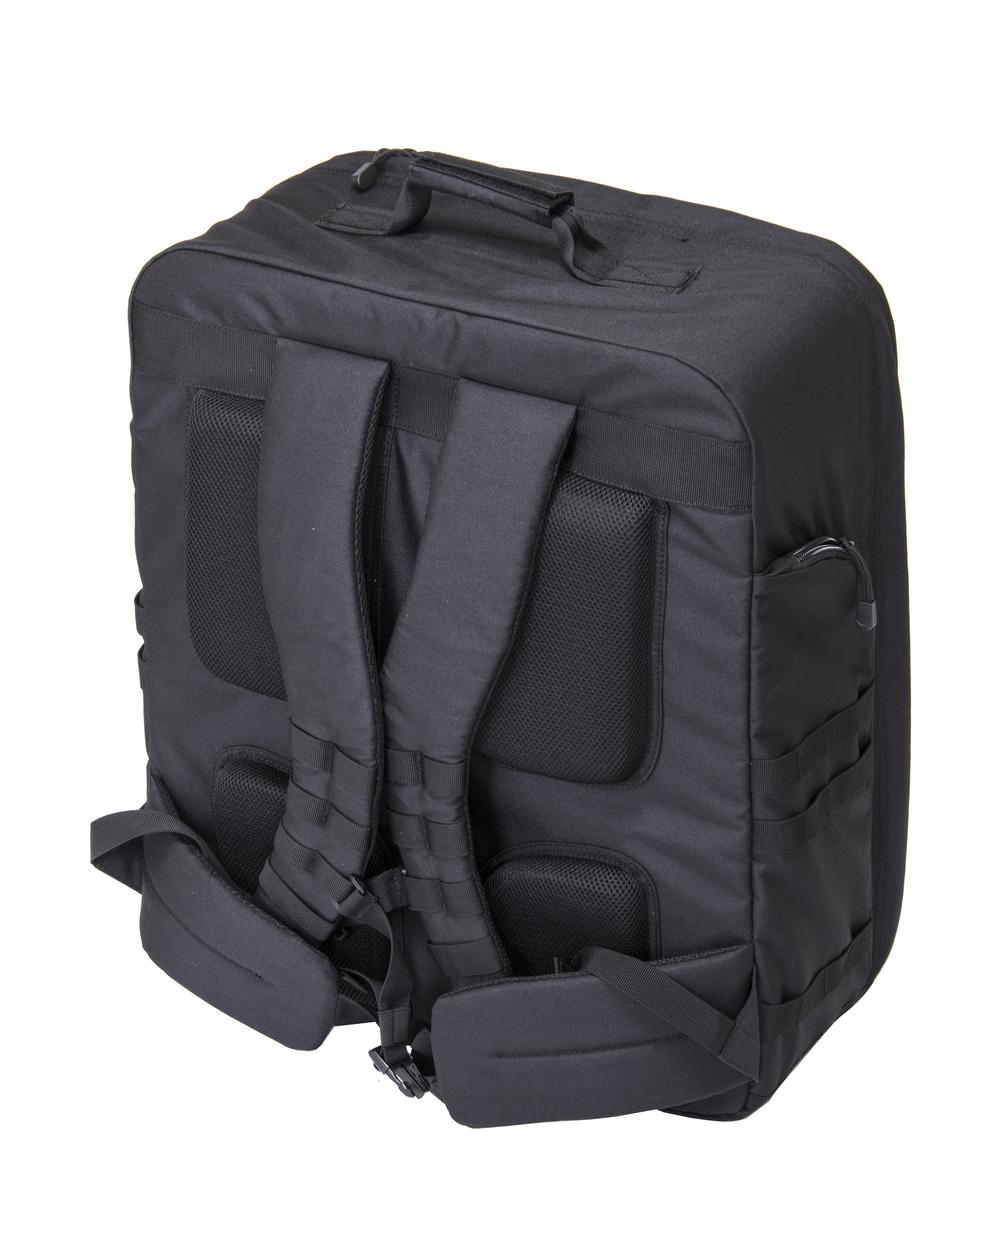 GPC_DJI_ Inspire_Backpack-062 BACK CLOSED MAIN.jpg